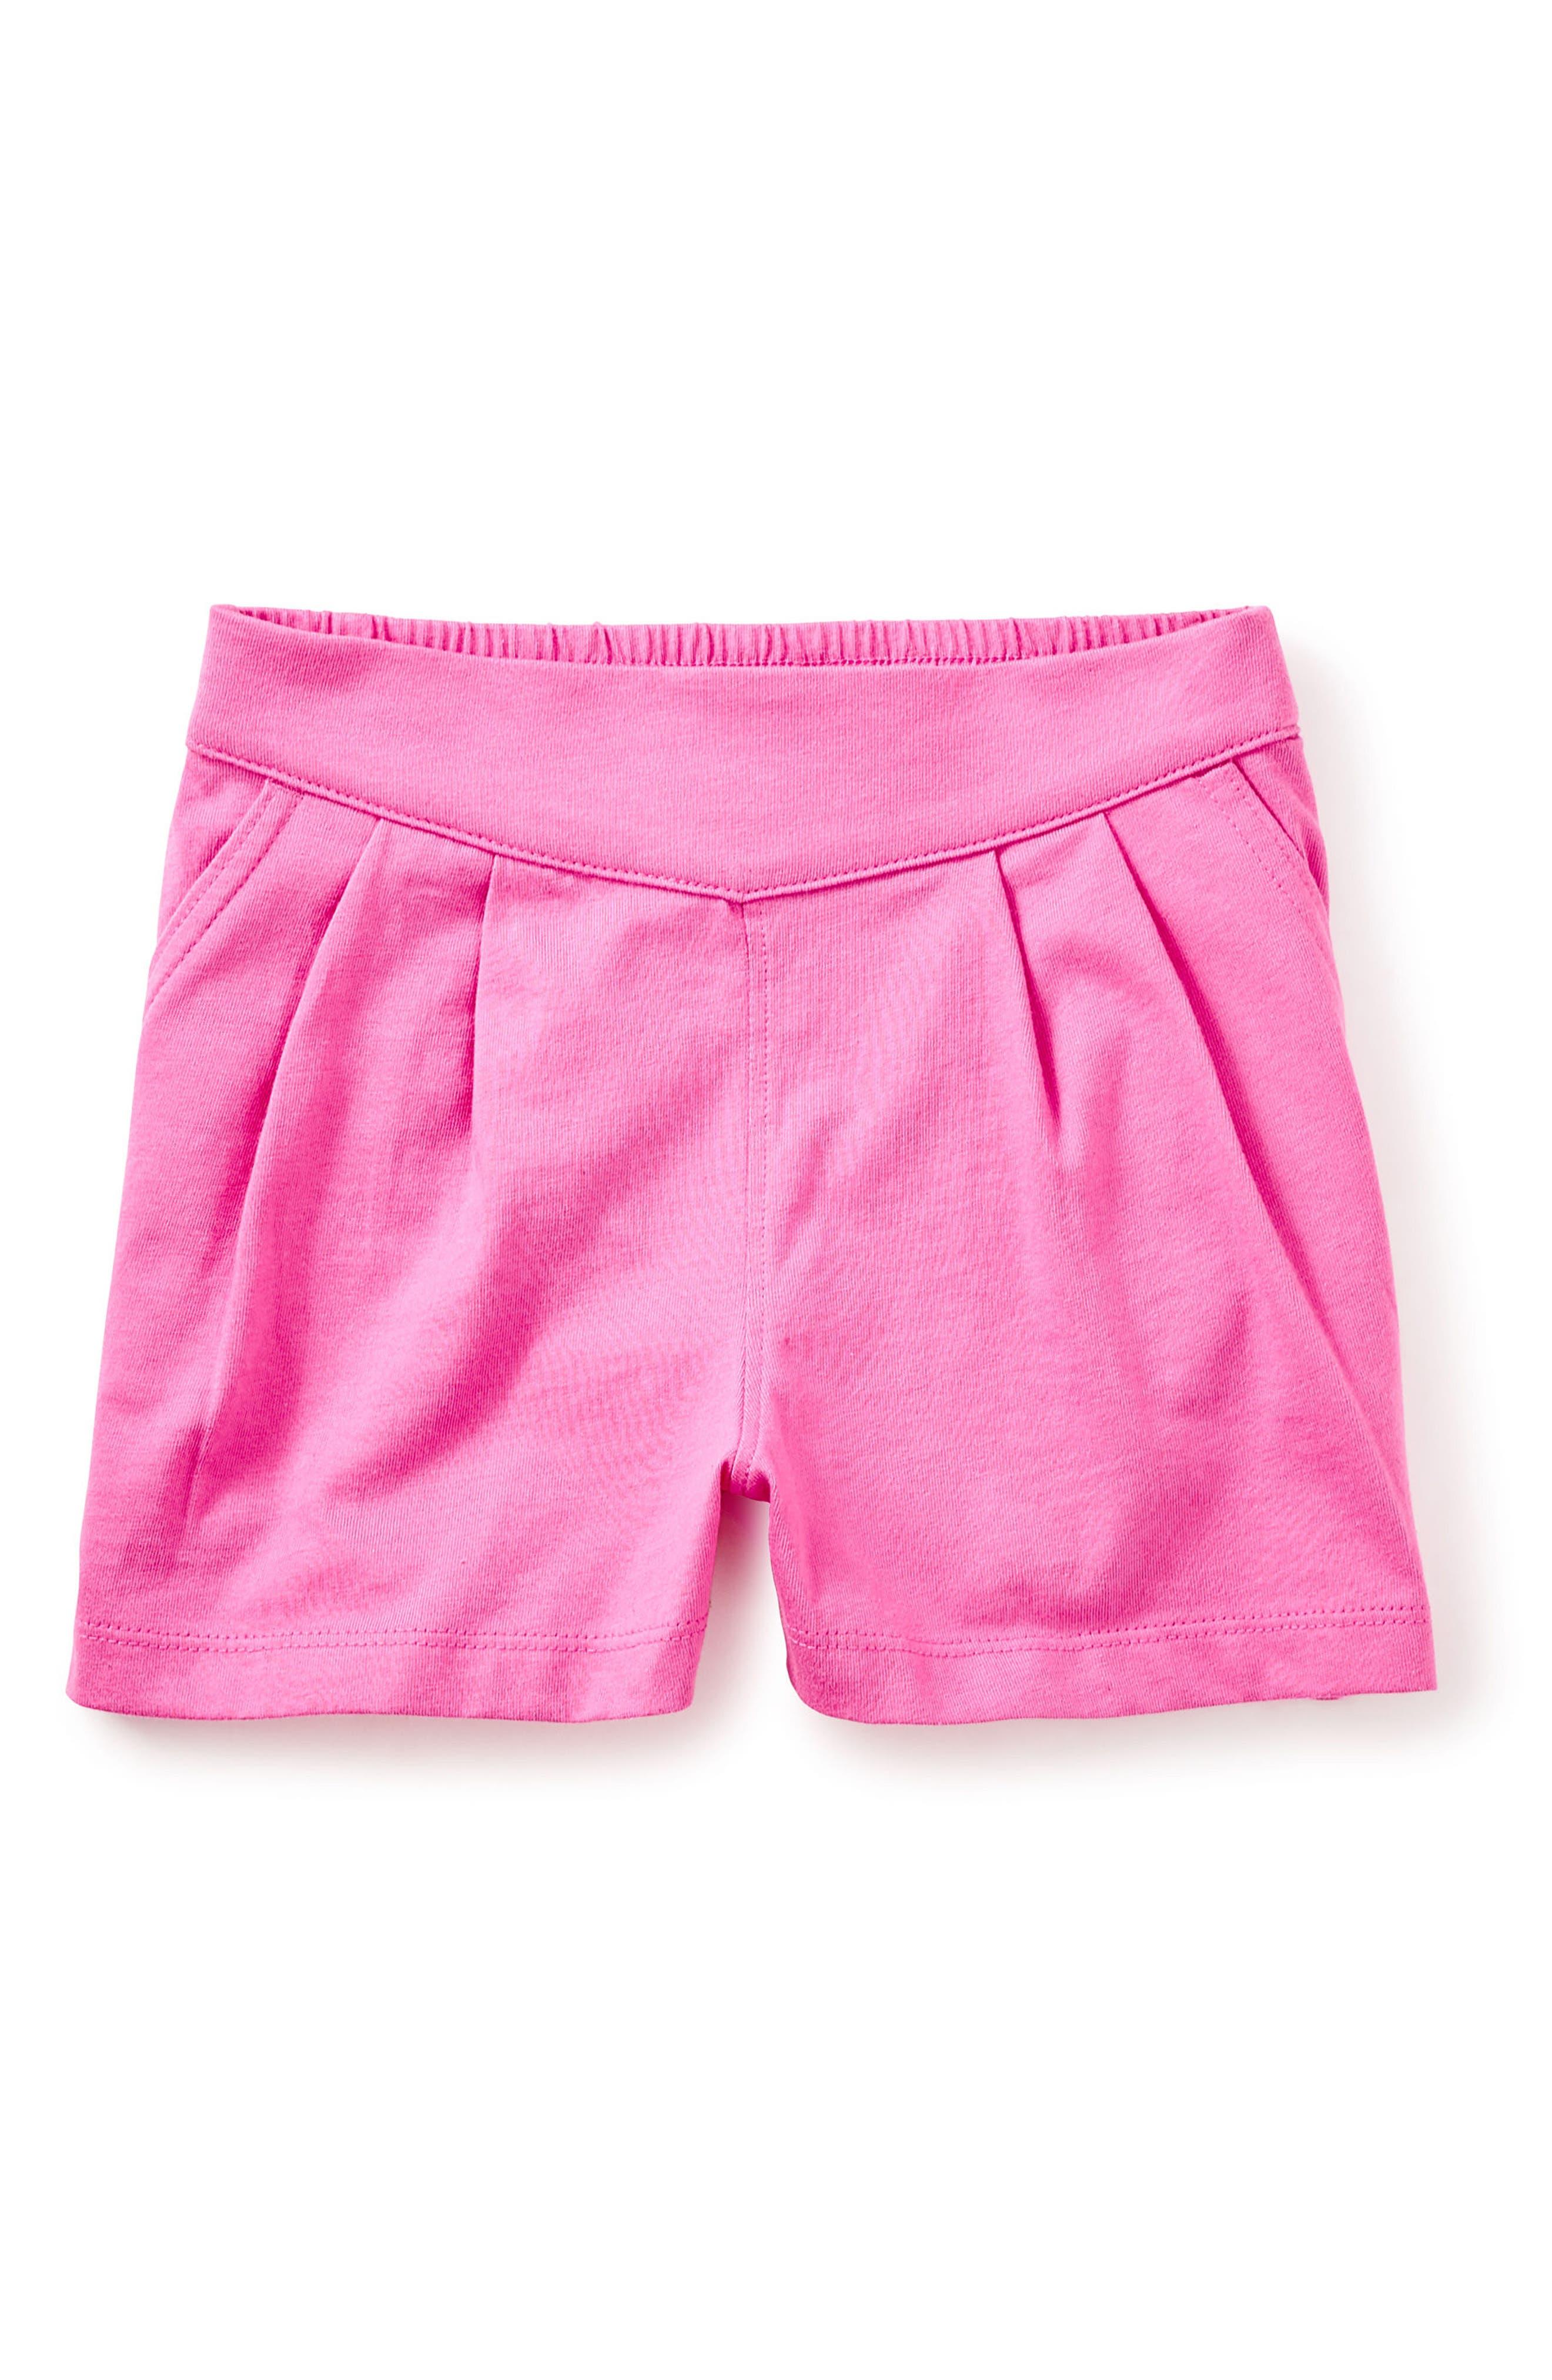 Tea Collection Boat Dock Shorts (Toddler Girls, Little Girls & Big Girls)